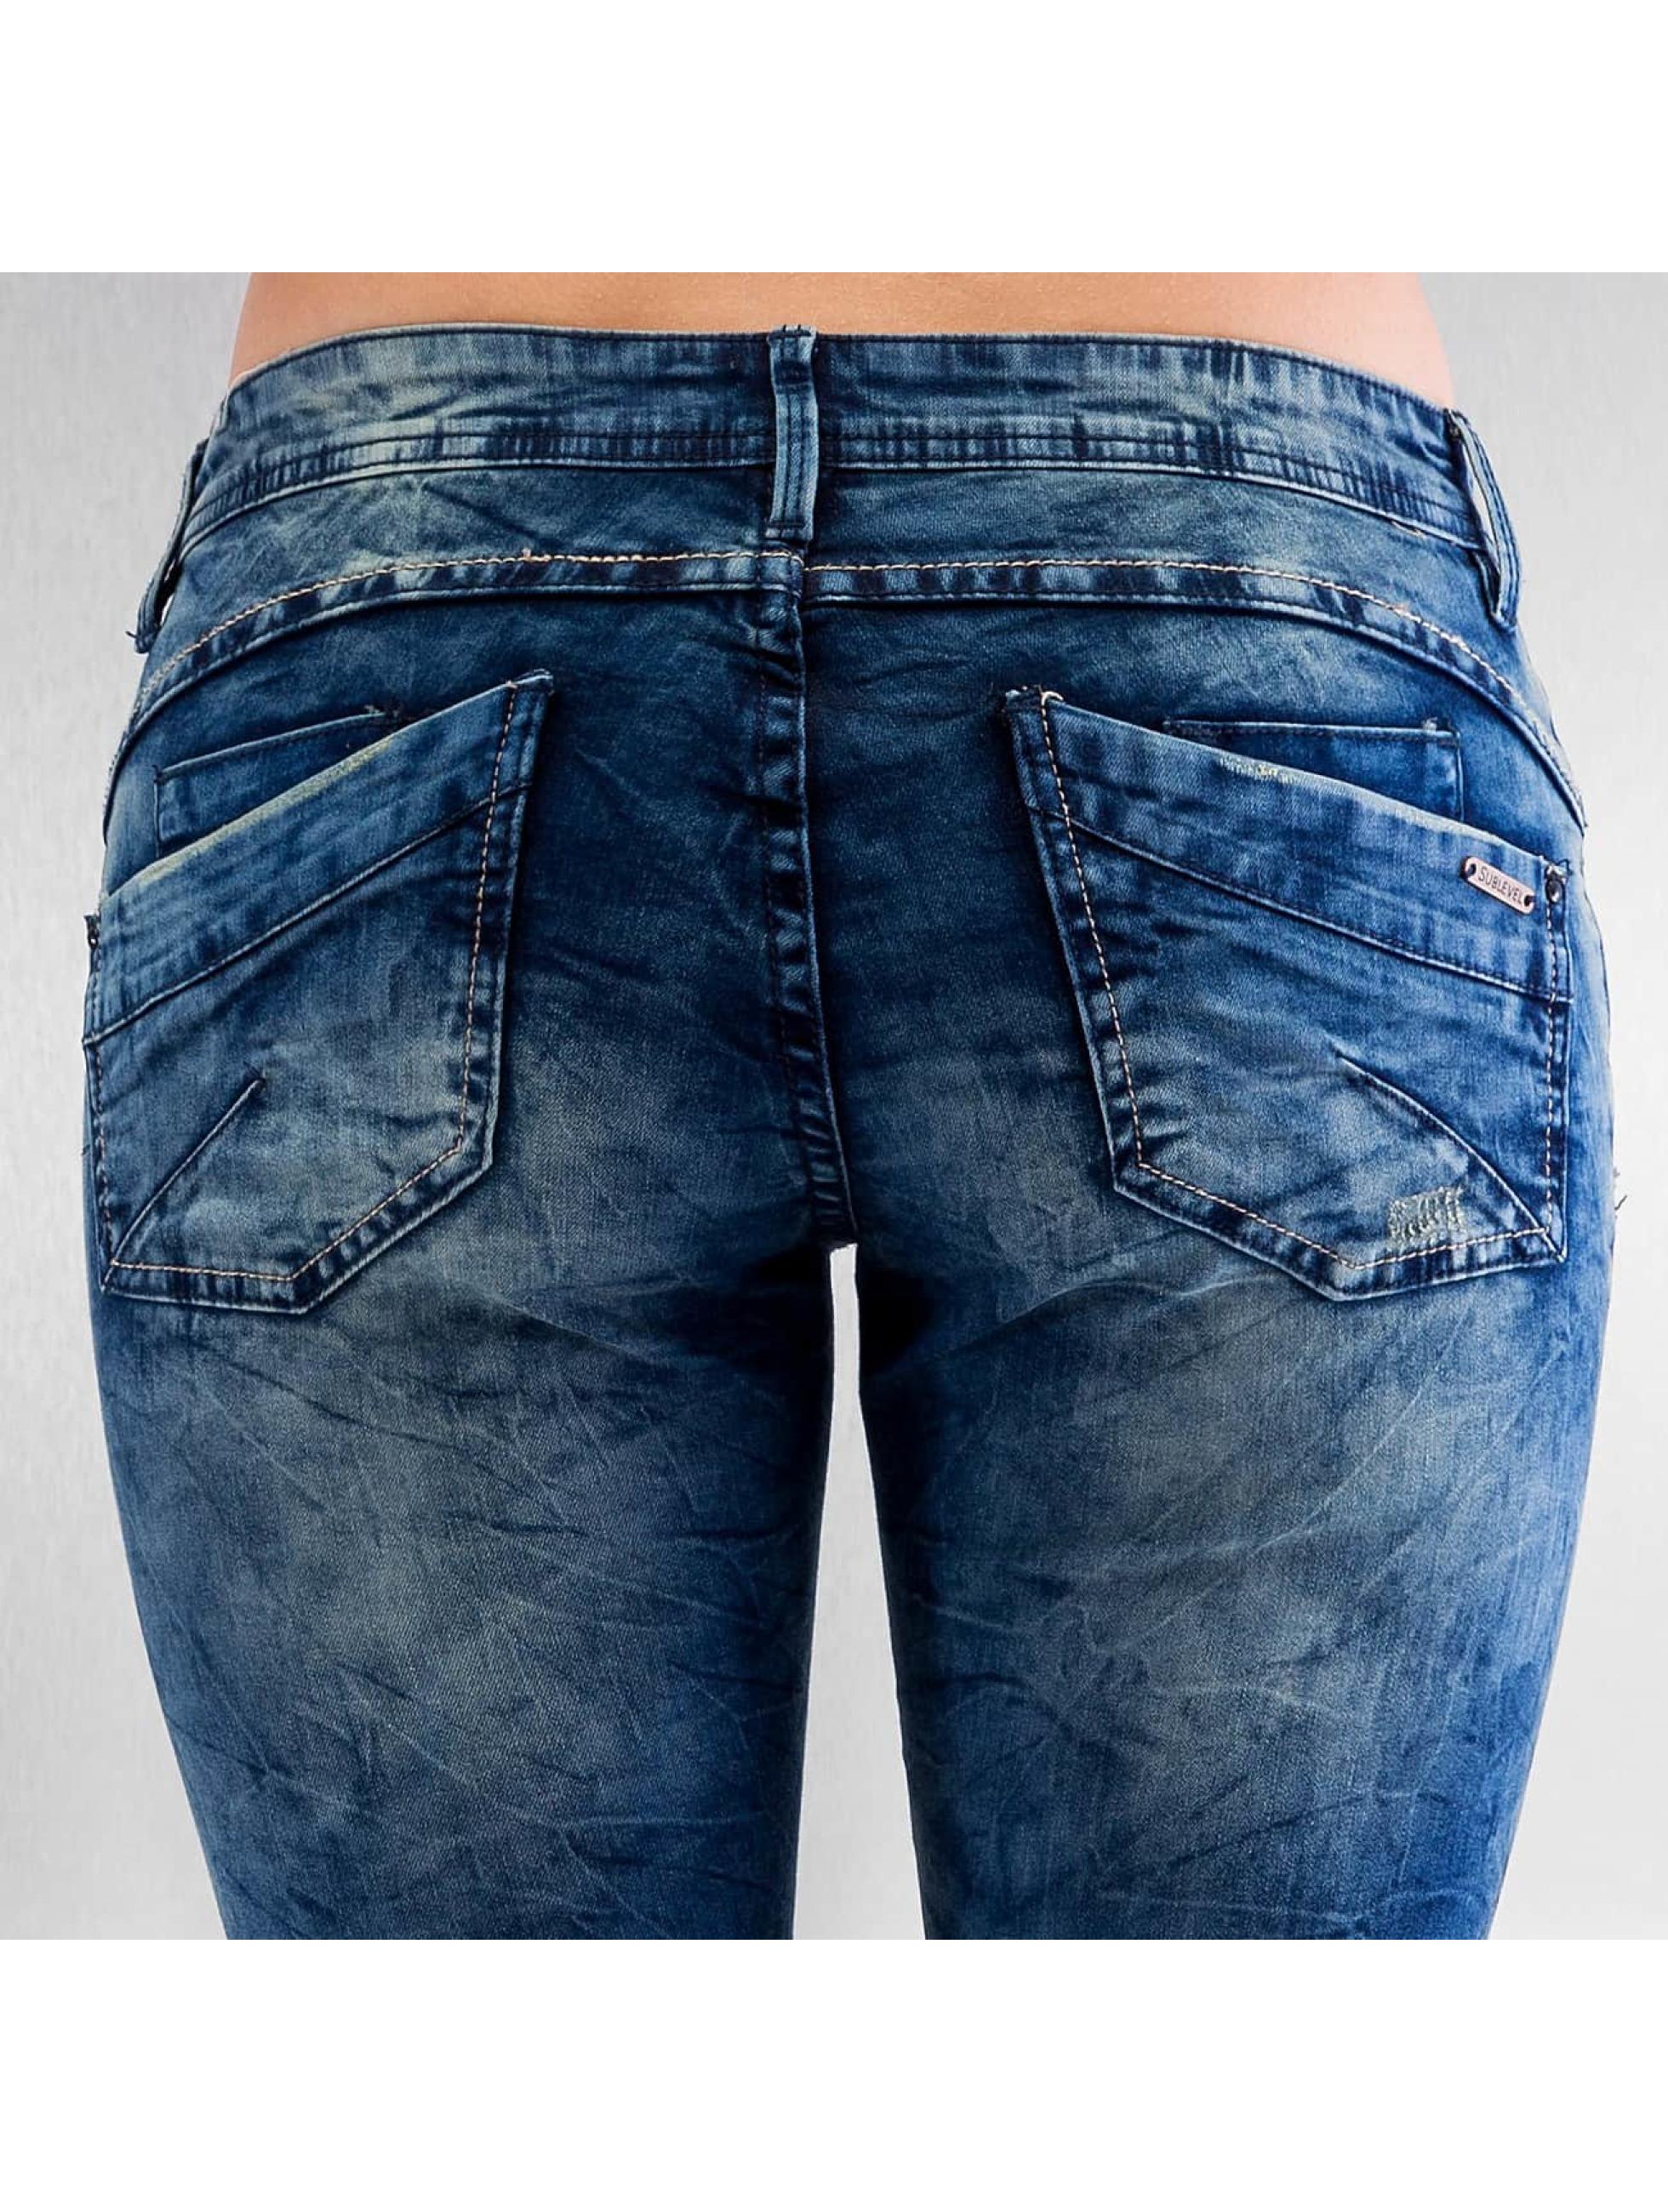 Authentic Style Облегающие джинсы Body Feel синий